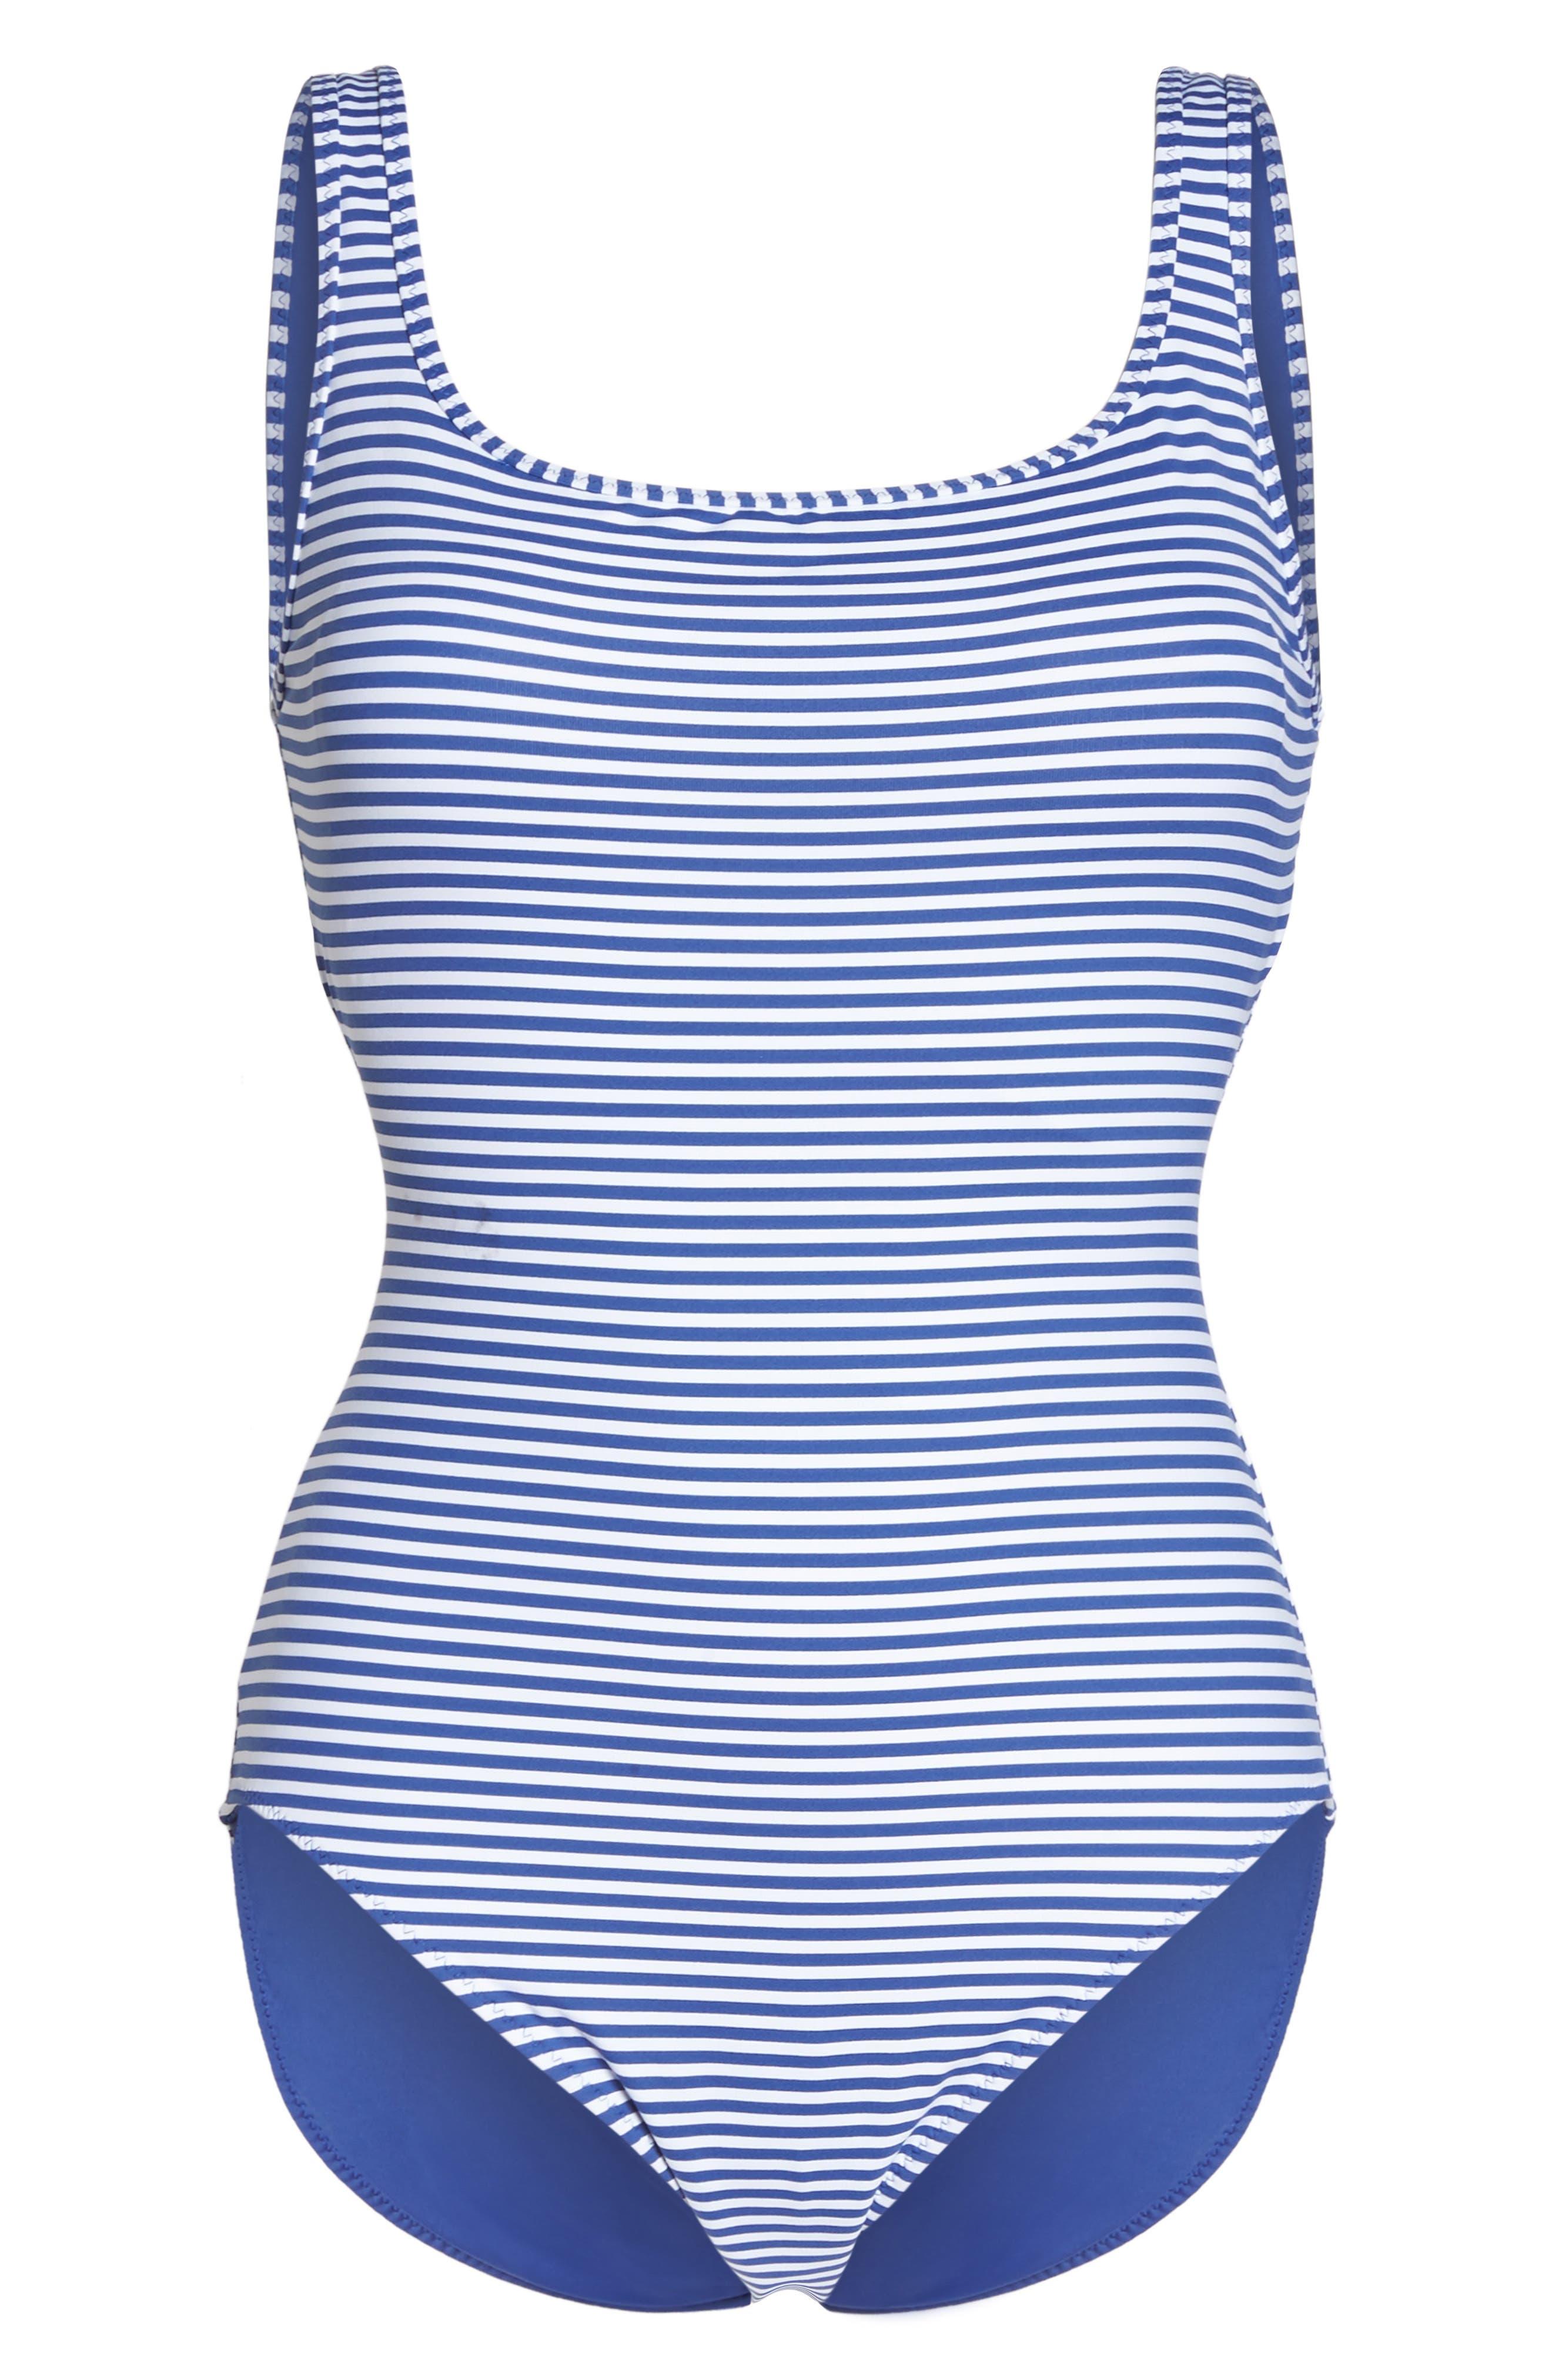 TOMMY BAHAMA, Reversible One-Piece Swimsuit, Alternate thumbnail 7, color, DARK SANIBEL